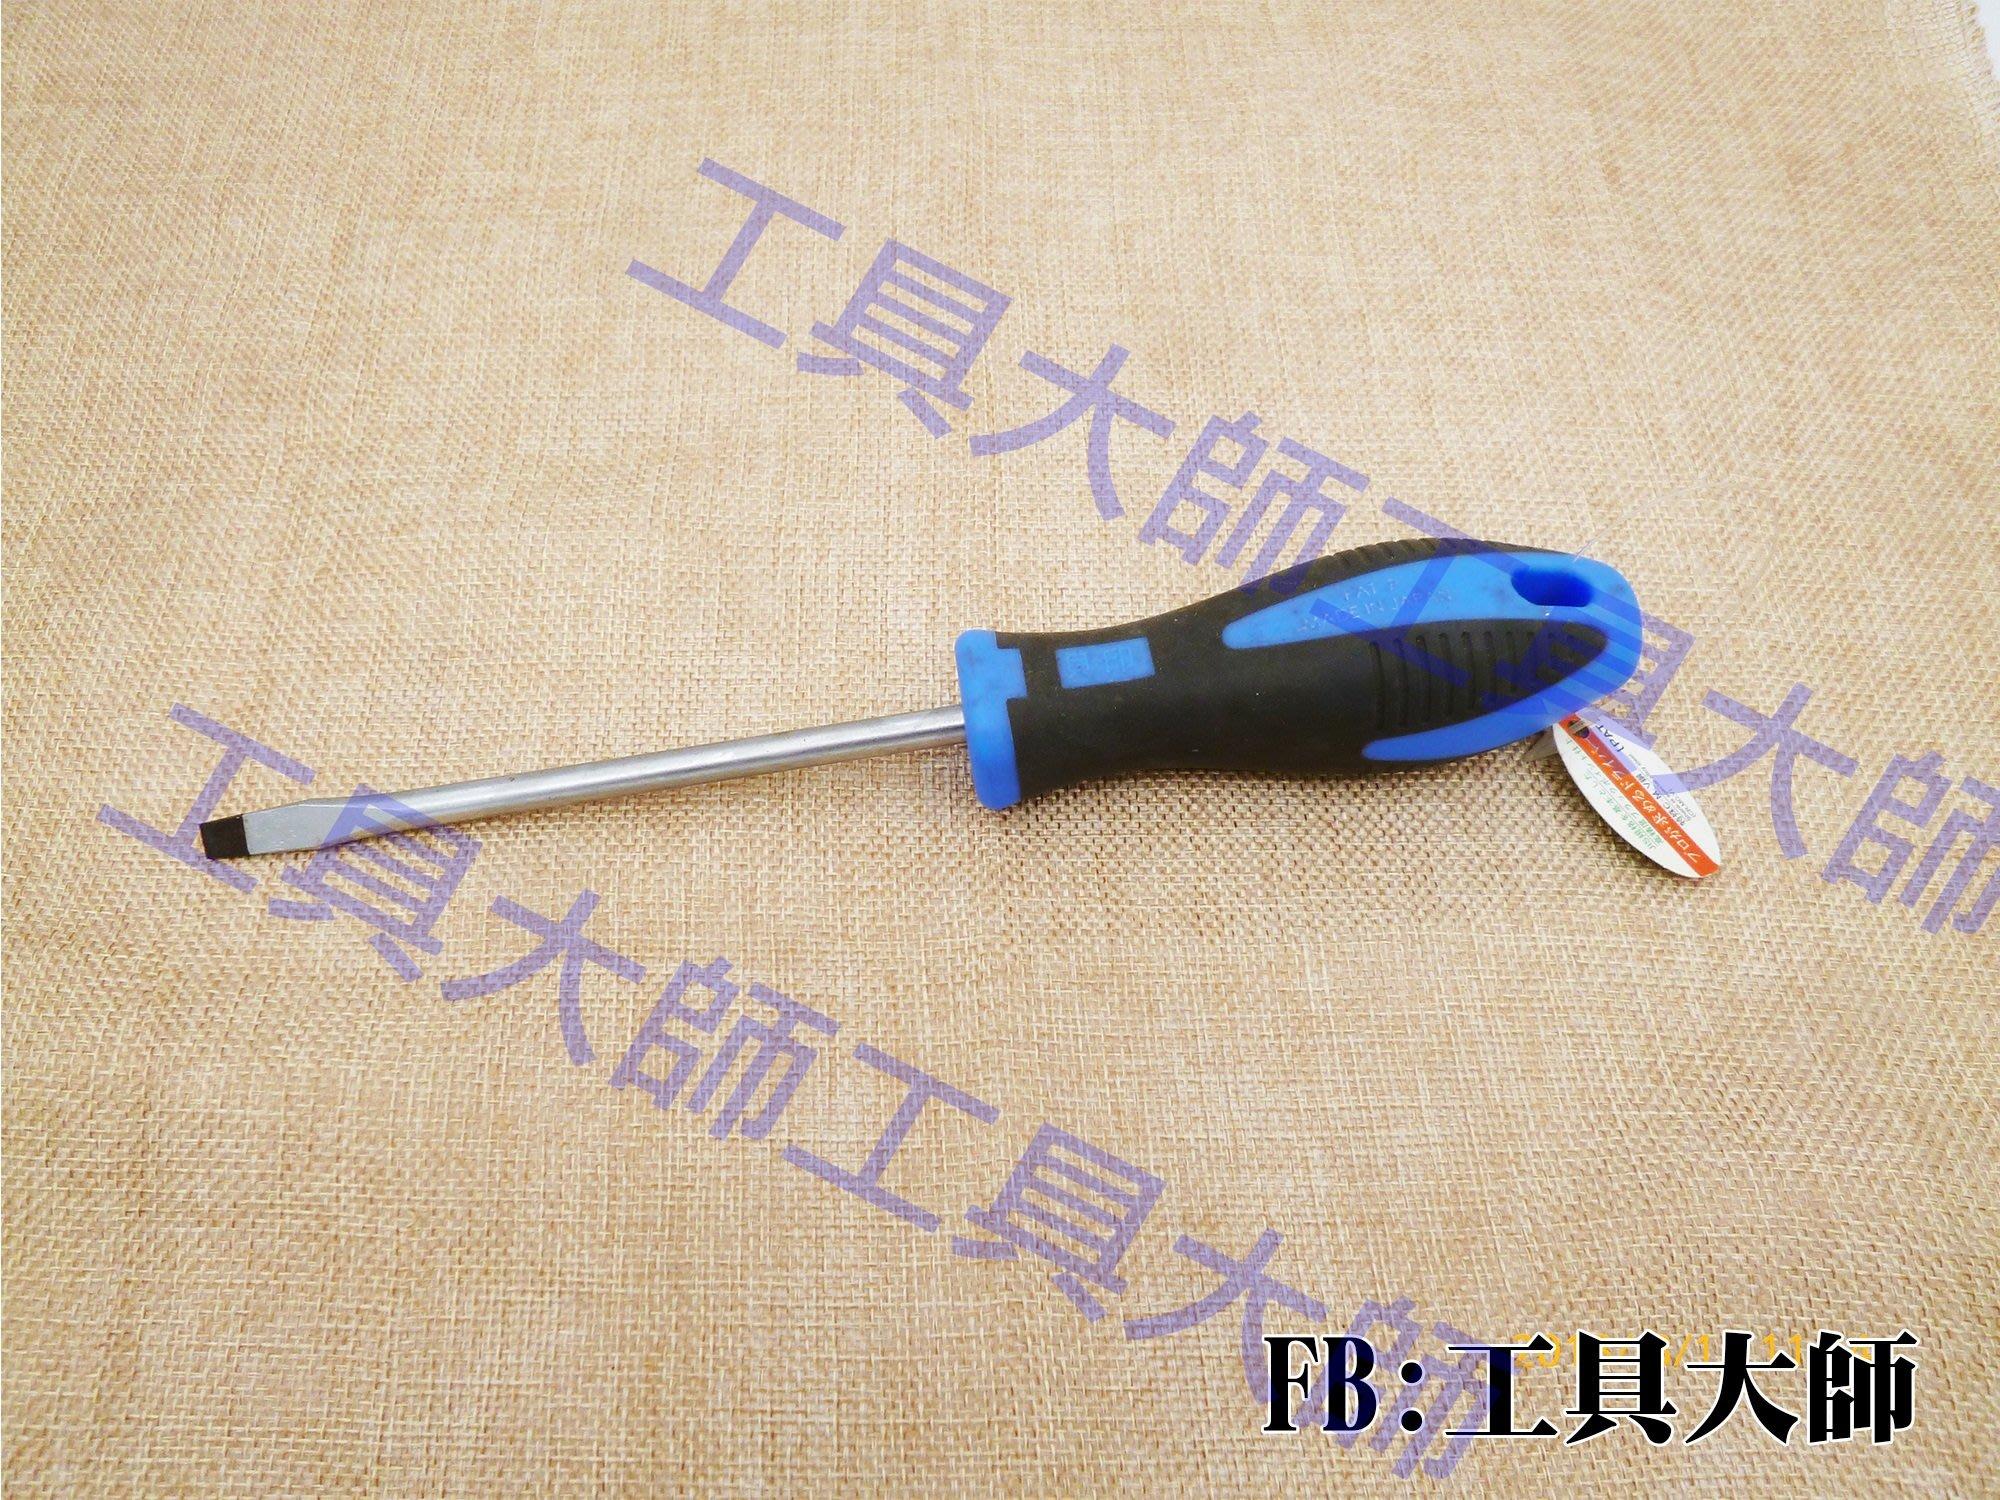 SHELL日本貝印 強力膠柄 螺絲起子 AX-3  藍柄一字 寬6.5mm 長125mm 水電 高級S2材質